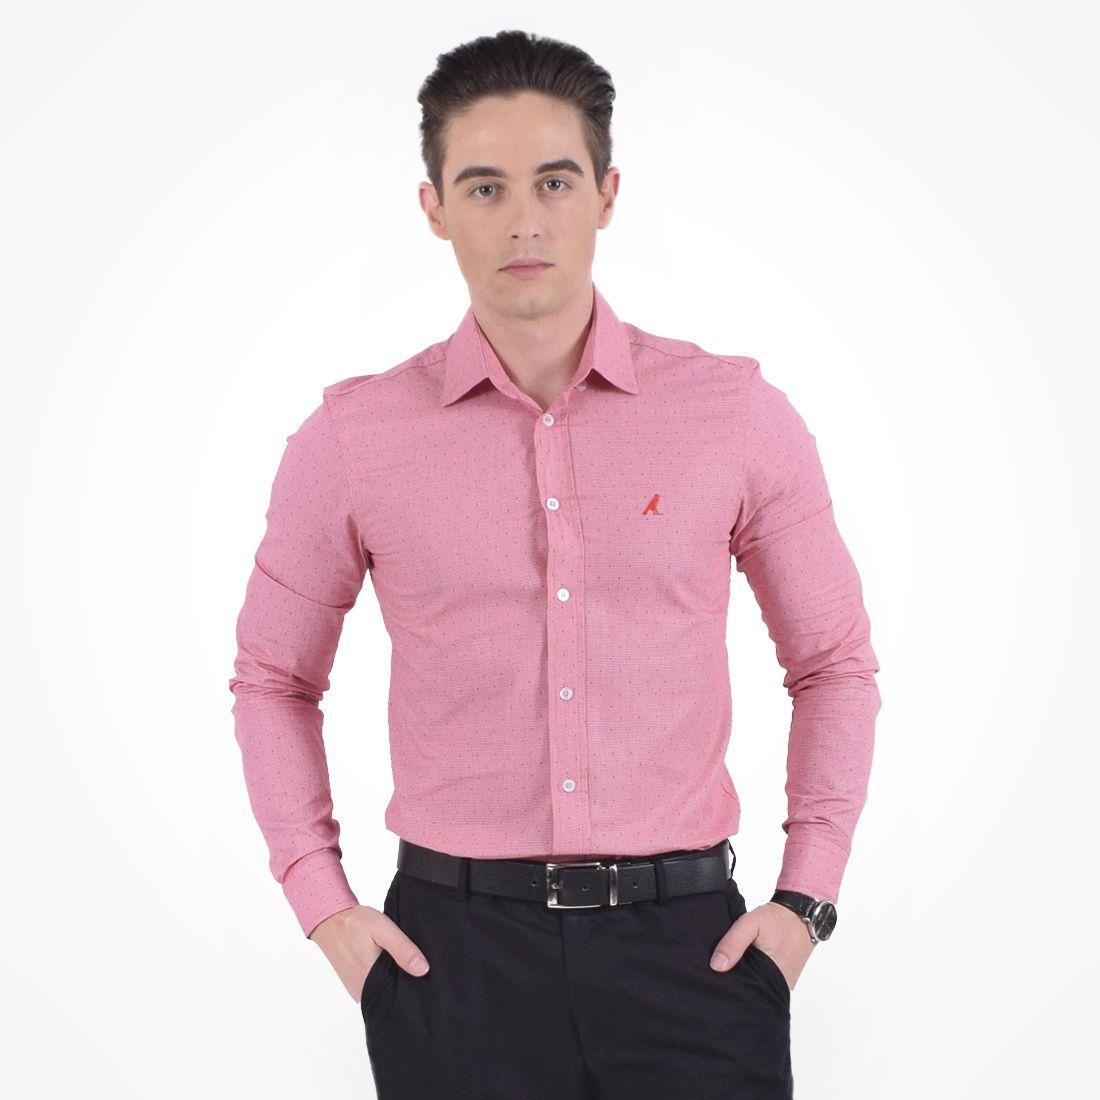 100207 - Camisa Social Vermelha Estampada Masculina Slim - LEVOK